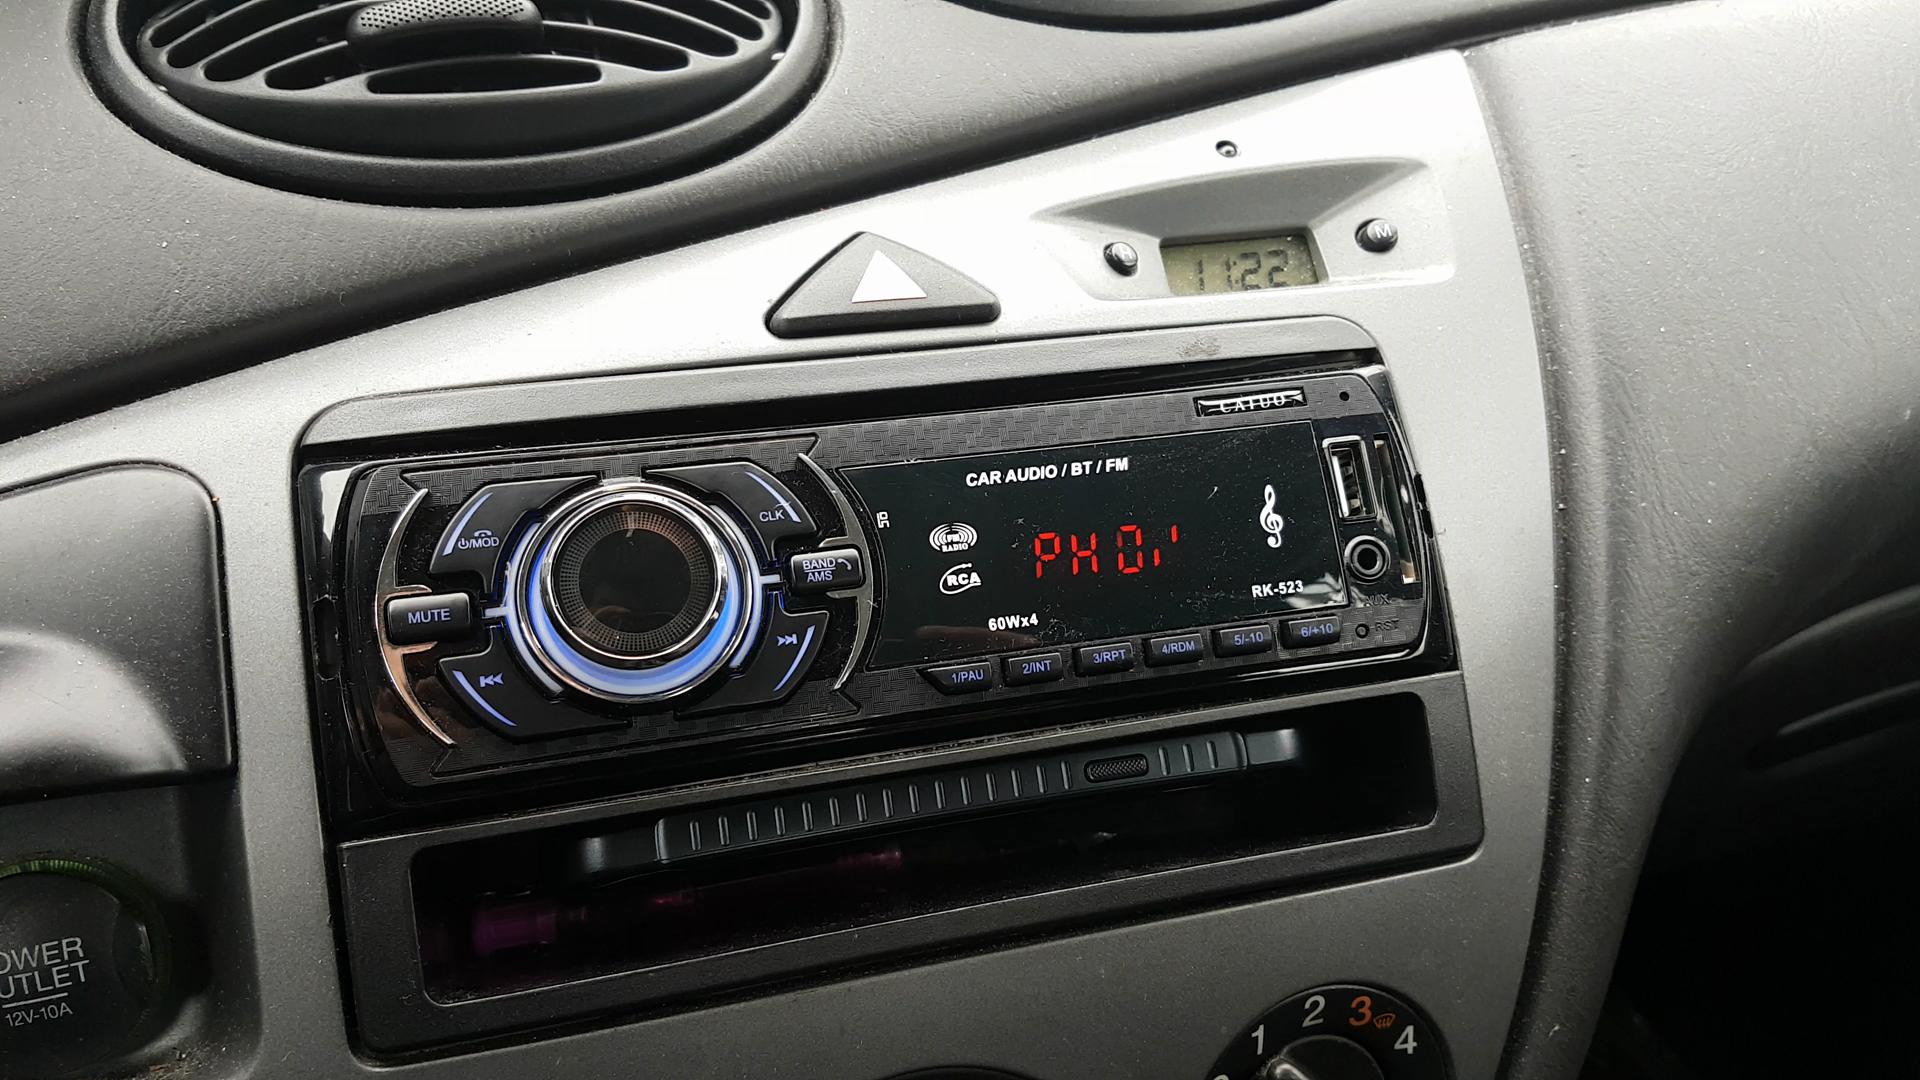 Amazon.de:Kundenrezensionen: Auto Radio MP3, Autoradio USB/SD/AUX ...